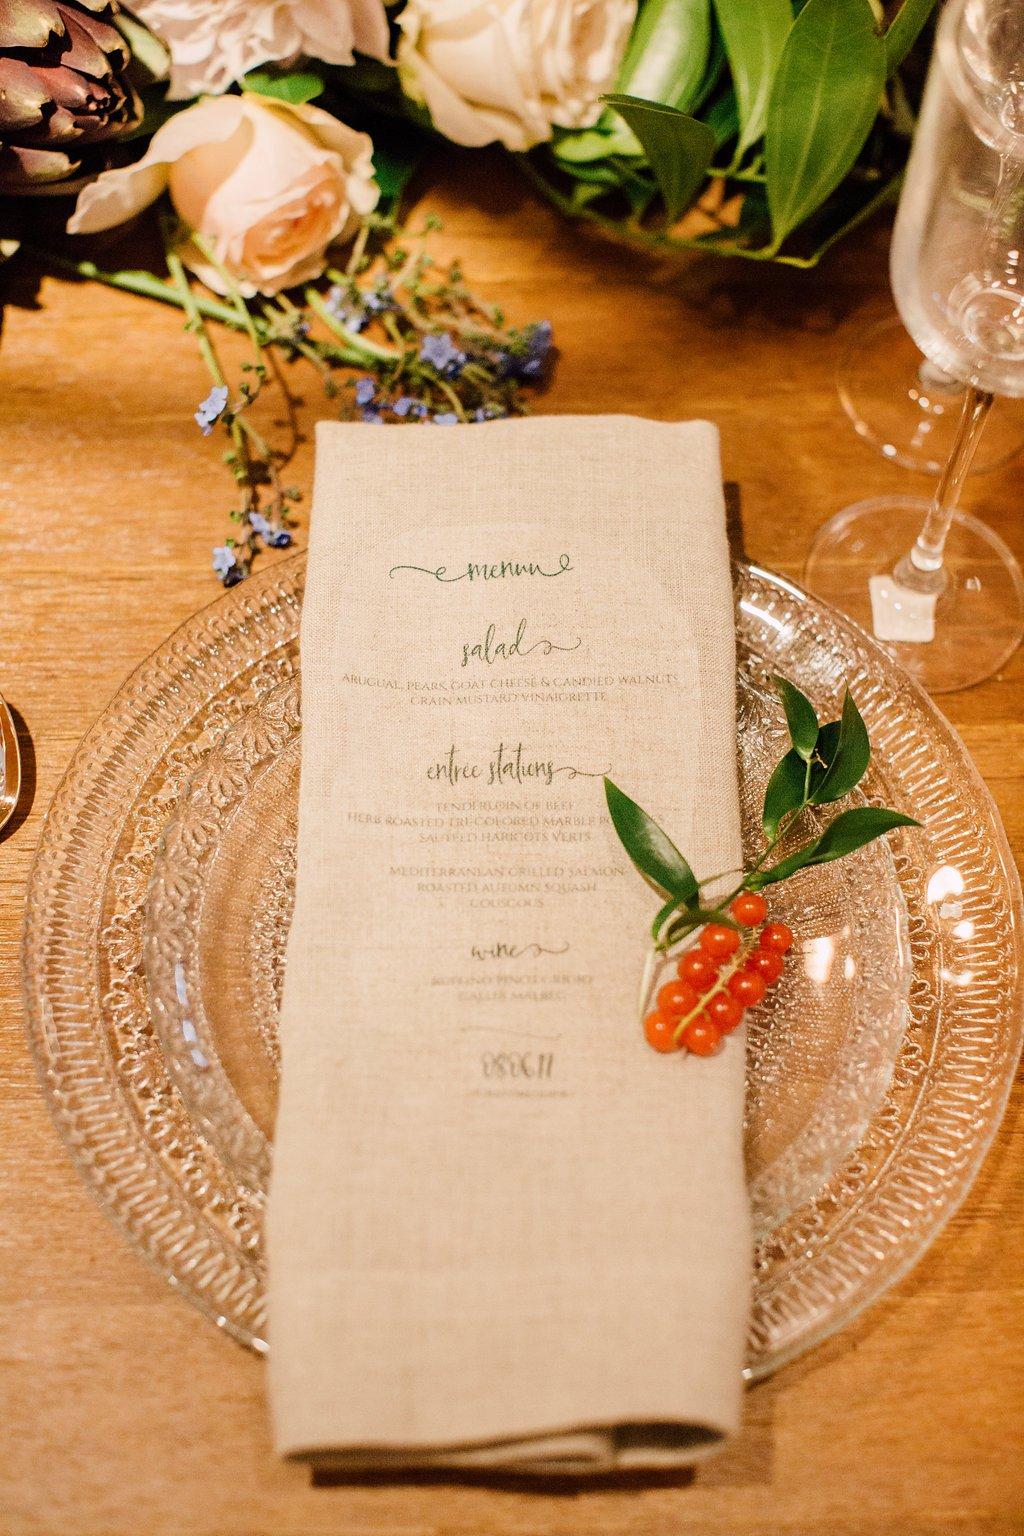 Glass plate with menu on napkin